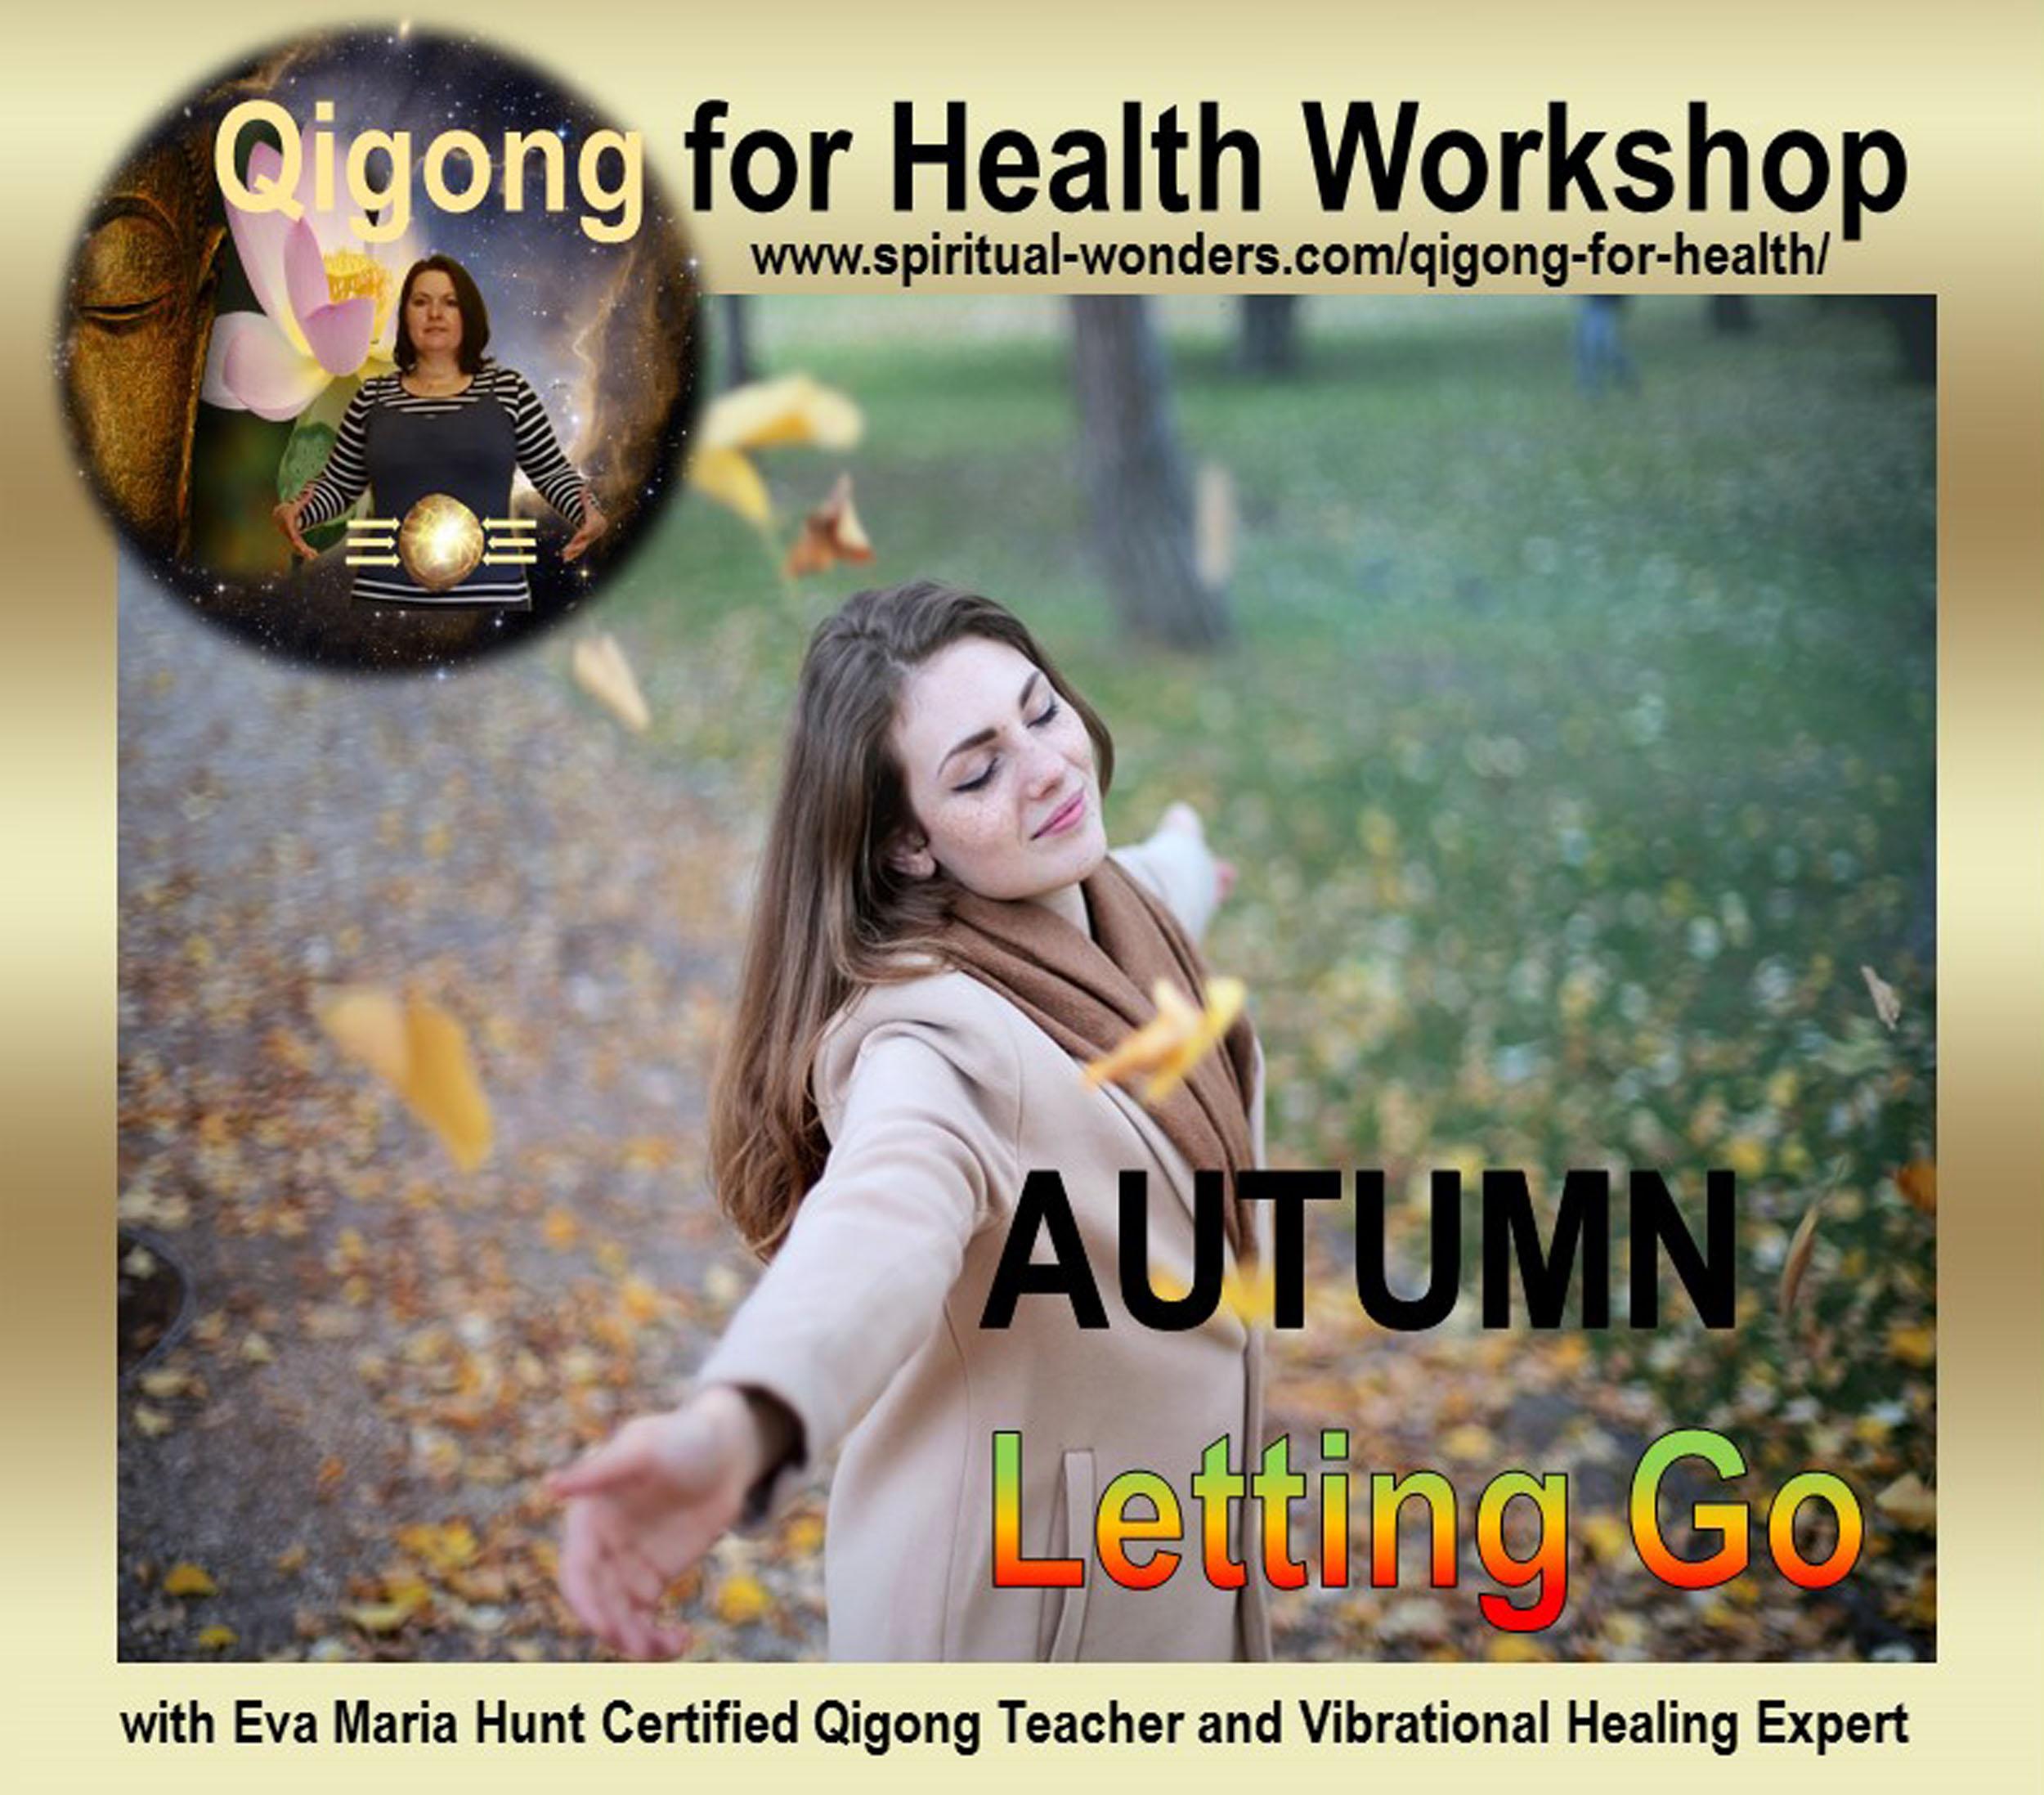 Qigong Workshop September 2019 - Spiritual Wonders